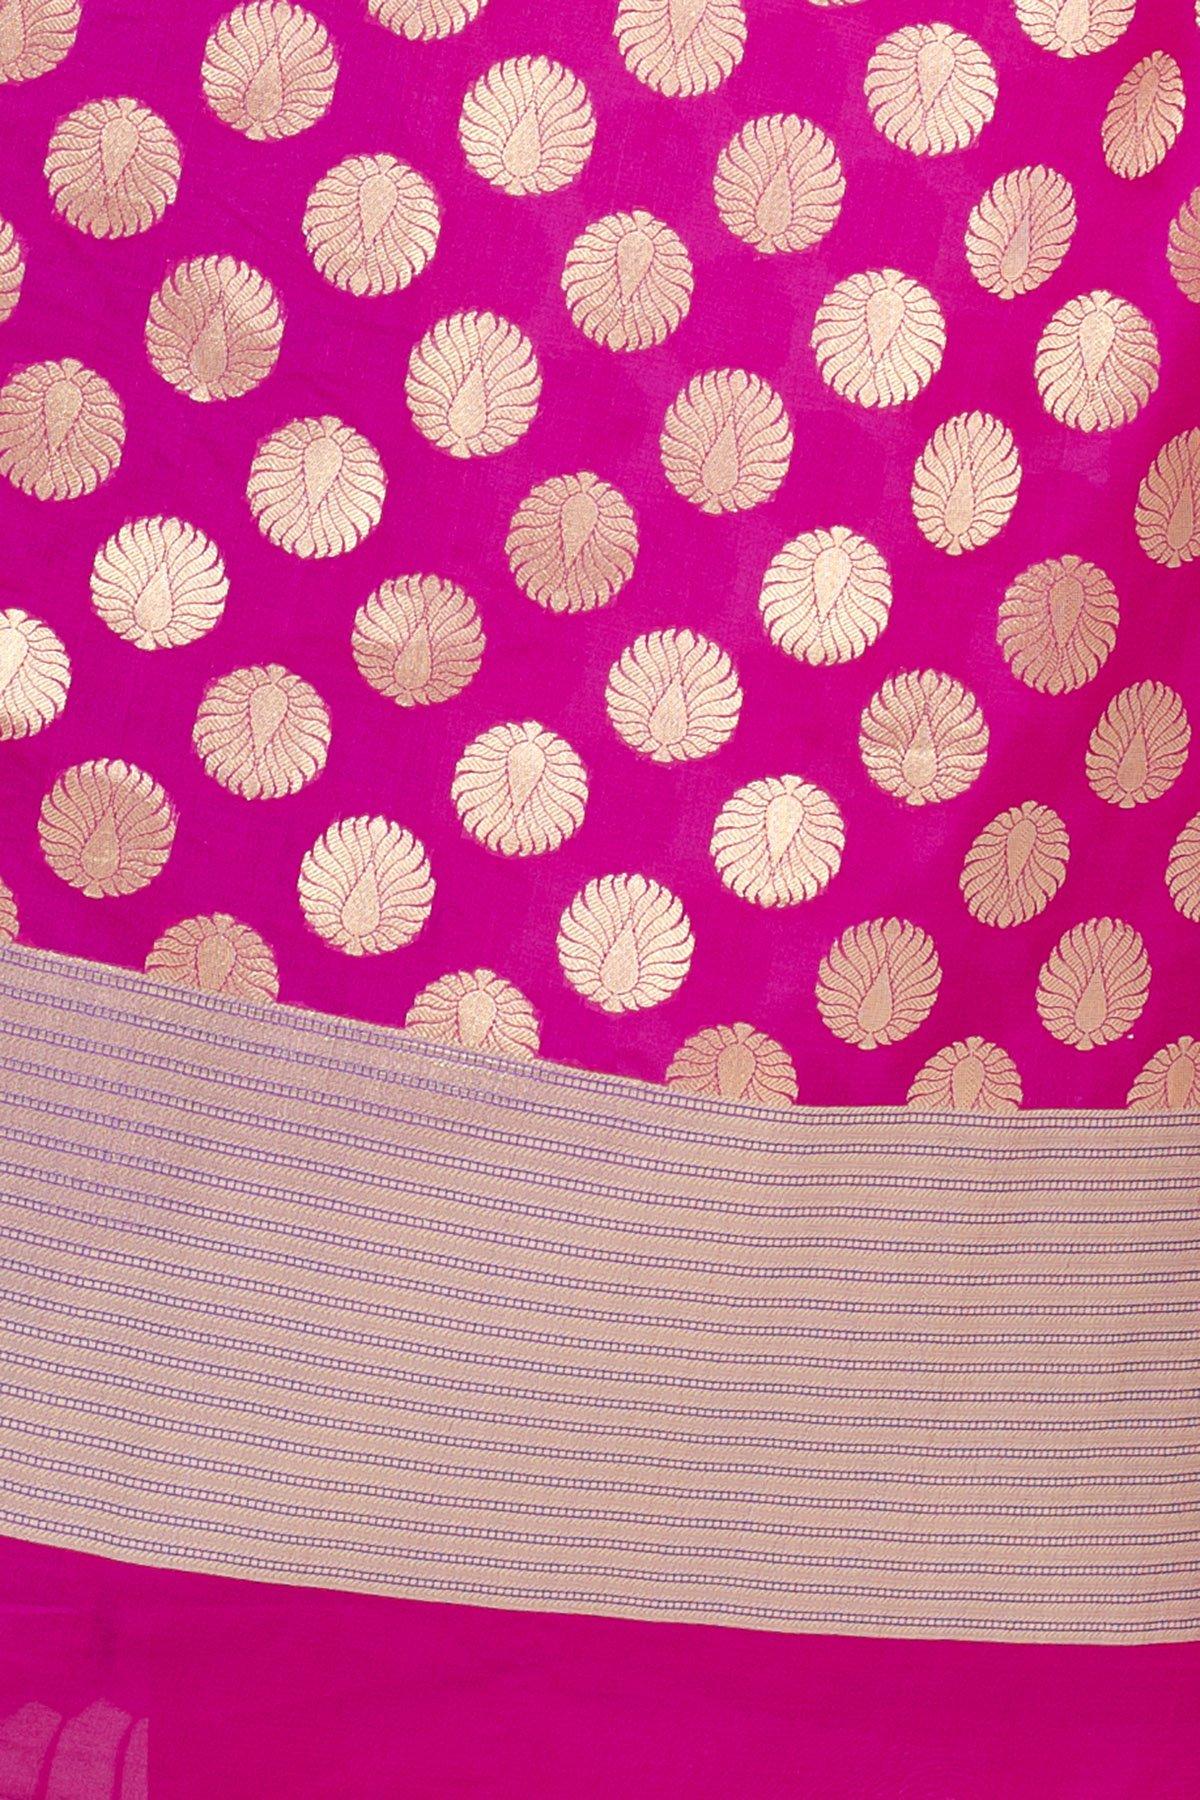 Chandrakala Women's Kataan Silk Blend Cutwork Brocade Banarasi Dupatta (Magenta) by Chandrakala (Image #4)